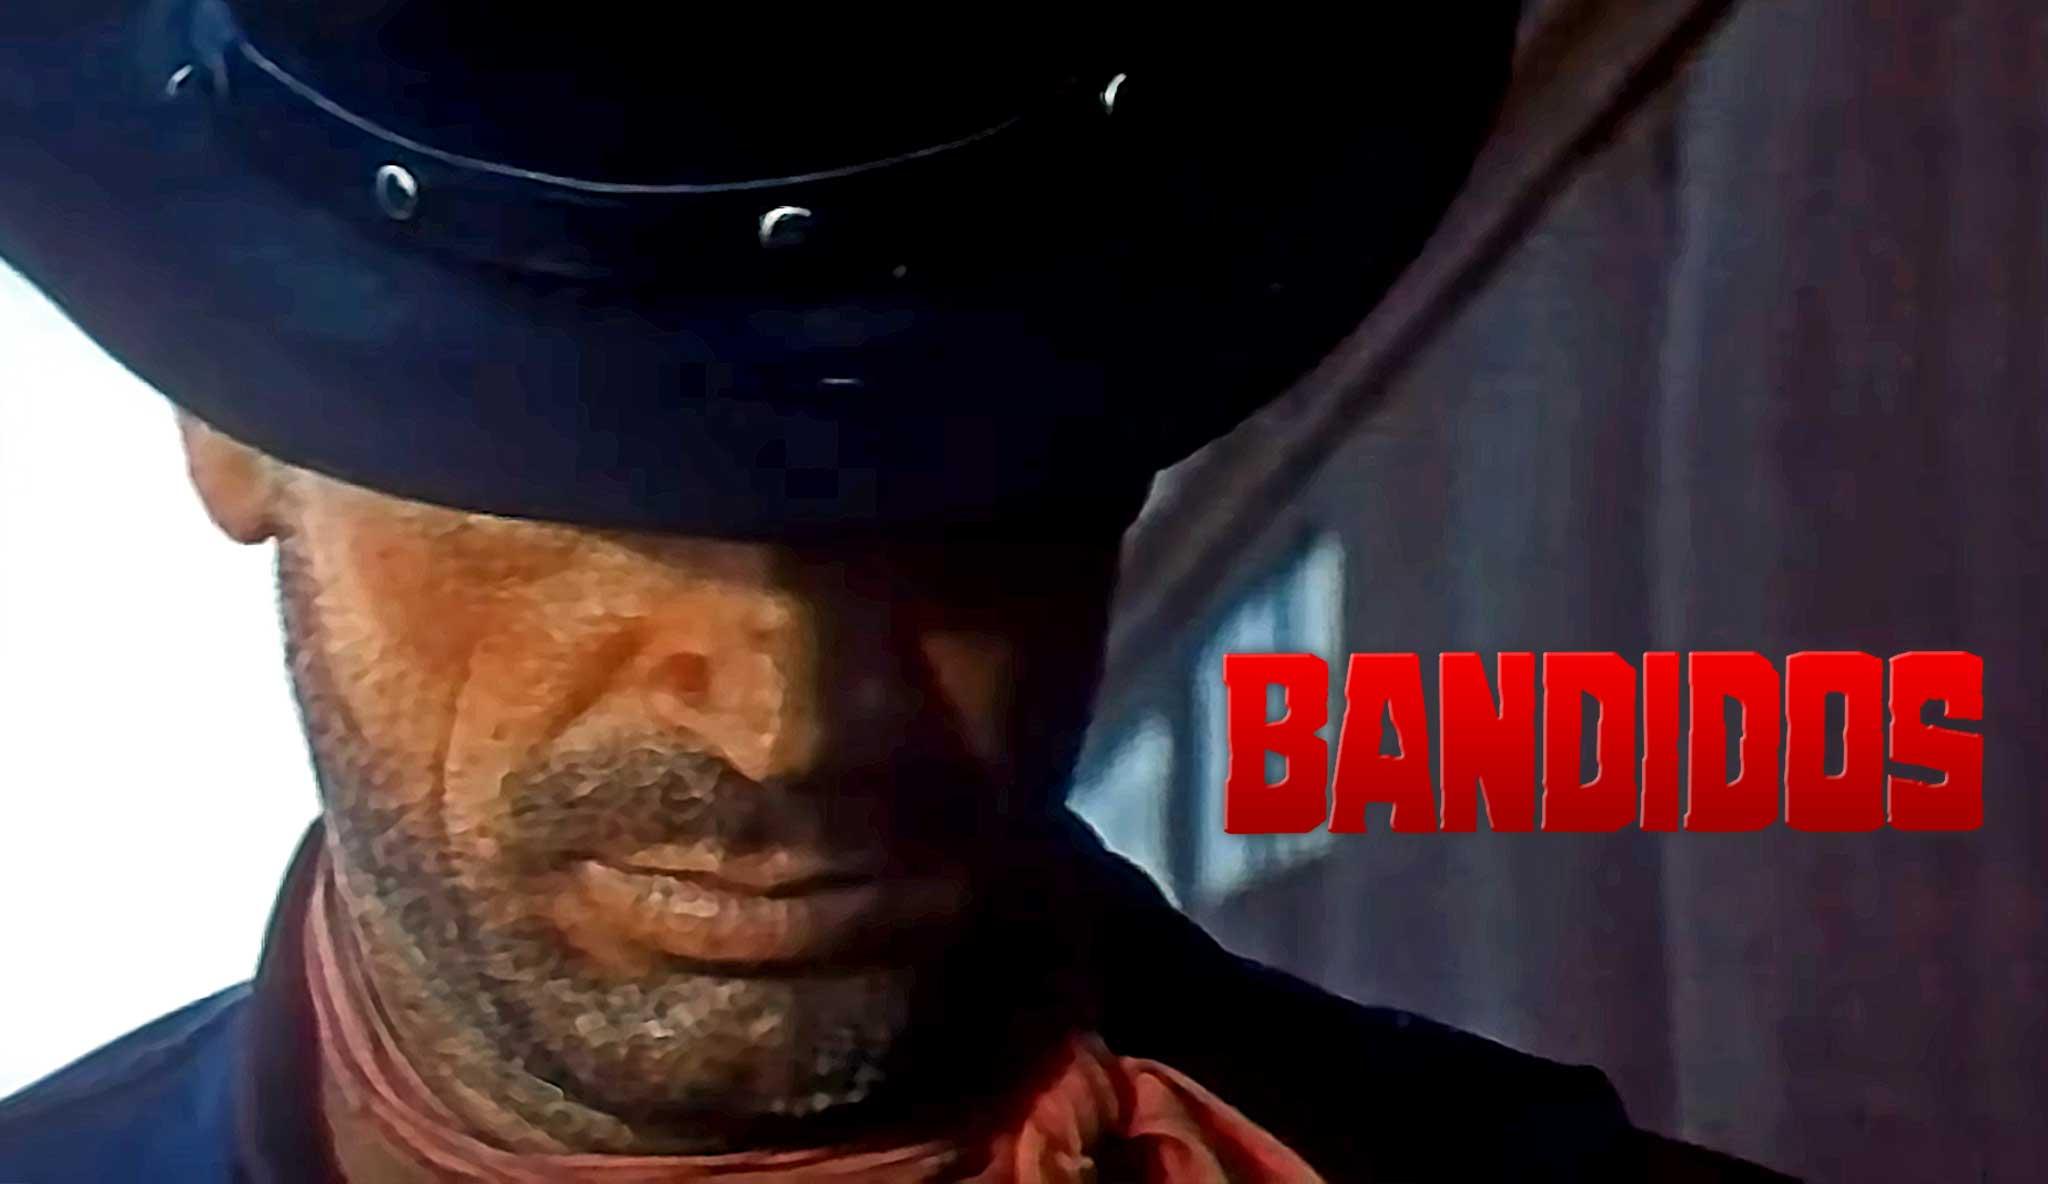 bandidos\header.jpg